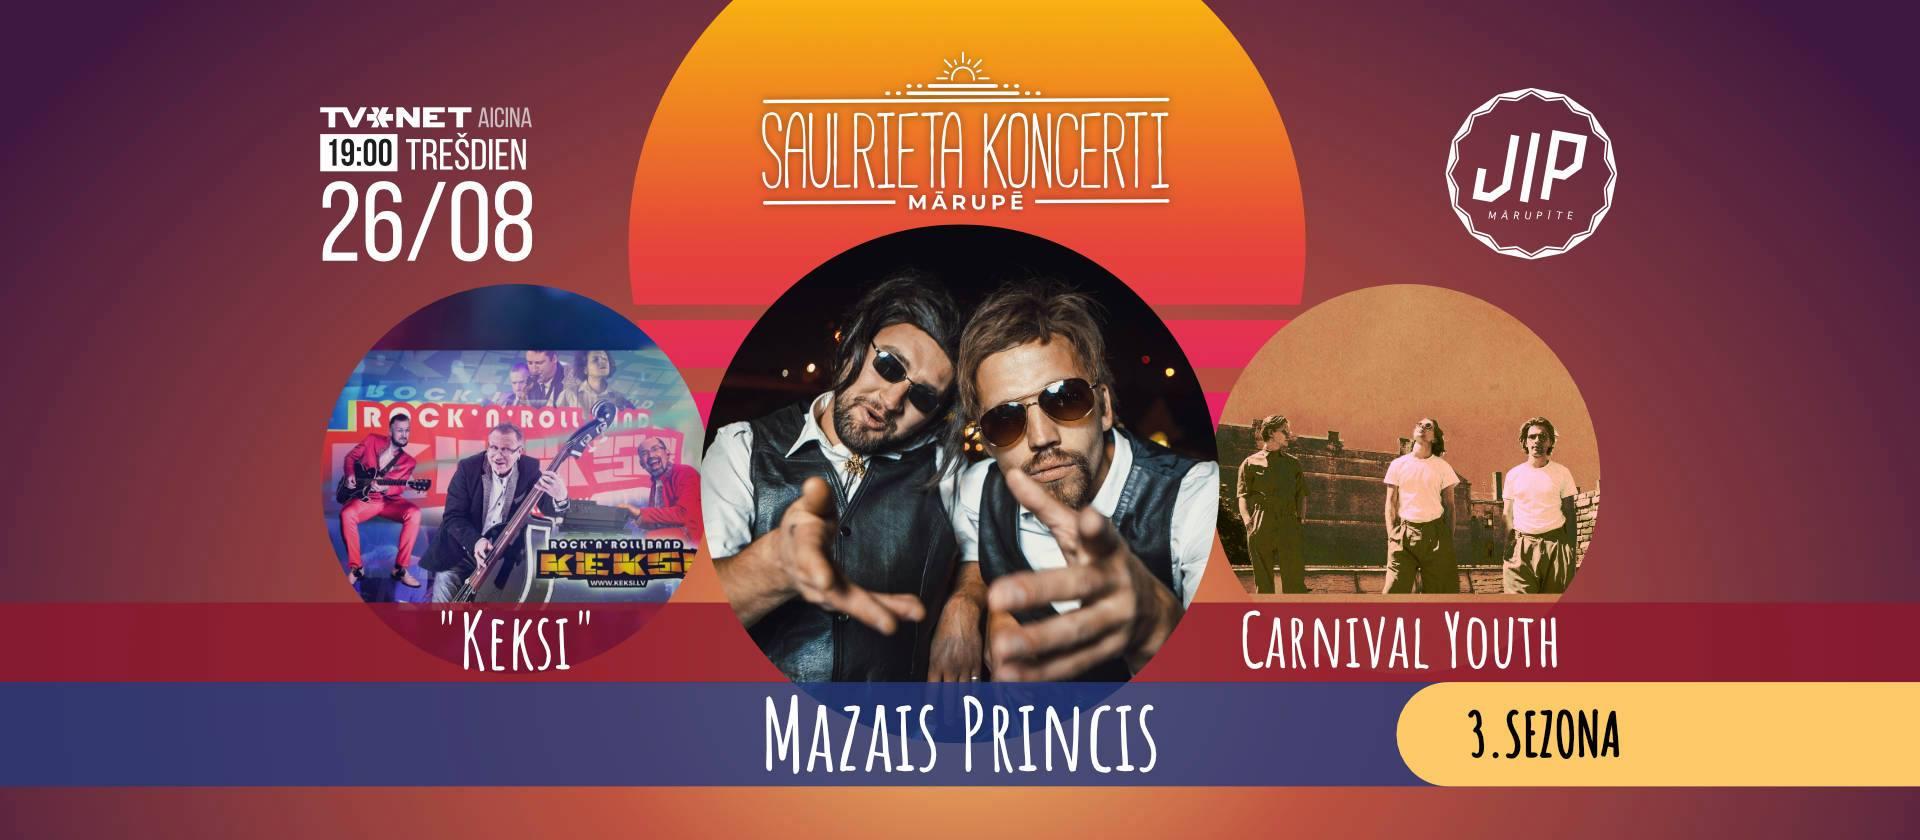 Mazais Princis, Carnival Youth, grupa KEKSI – Saulrieta koncerti